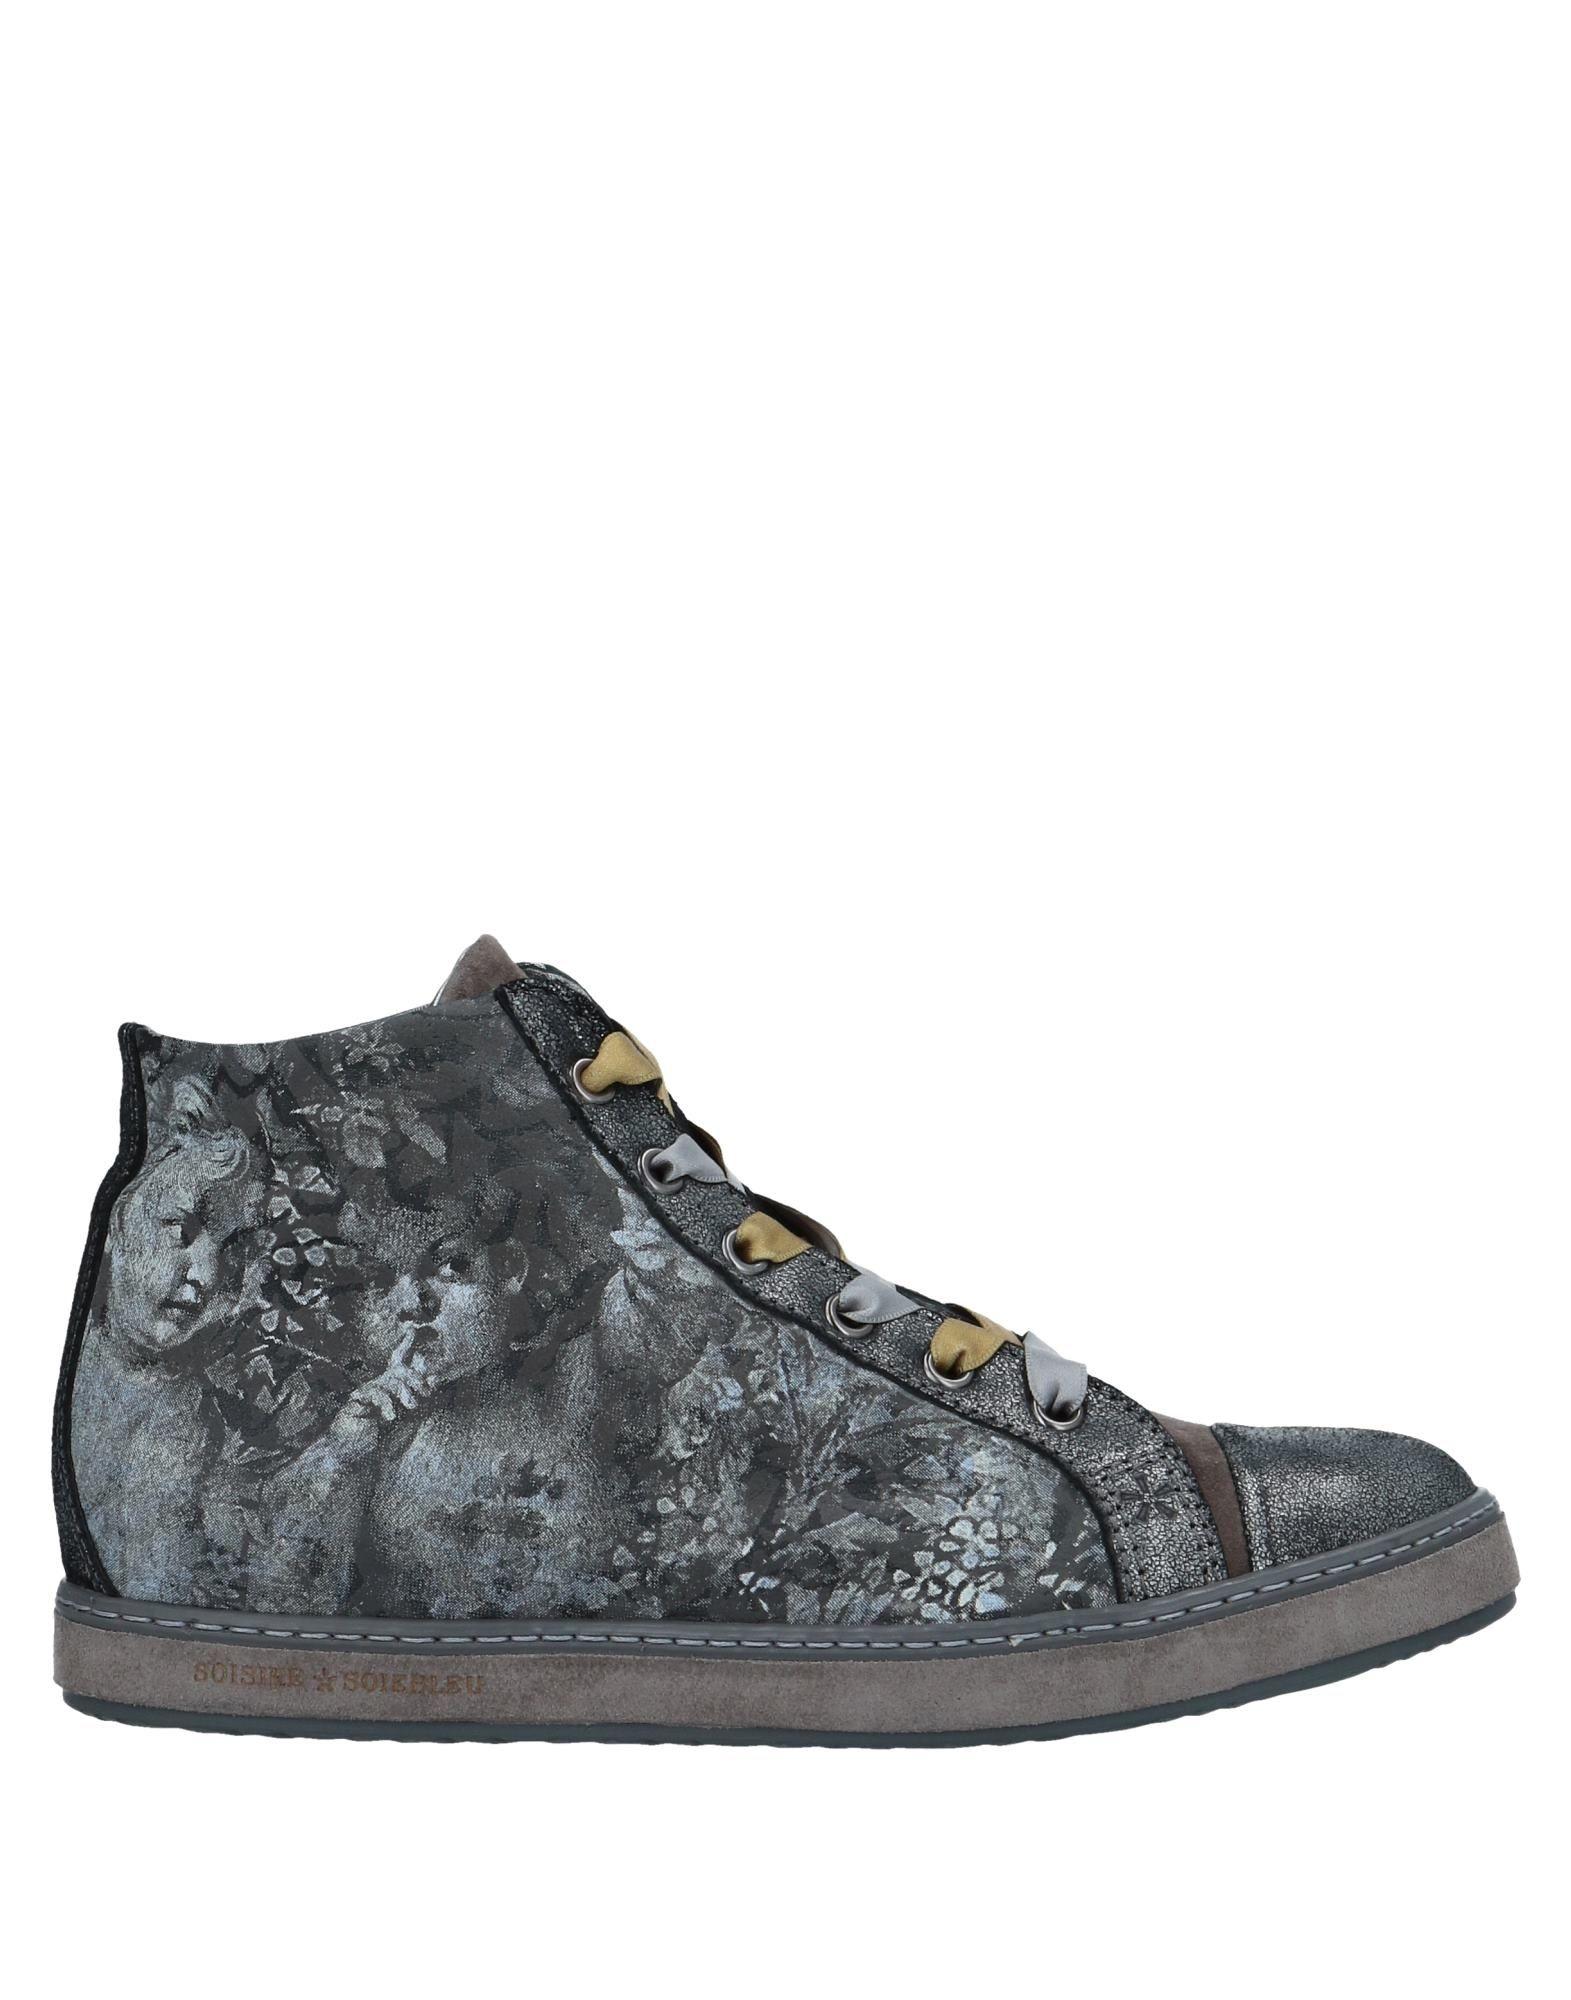 Soisire Soiebleu Sneakers Damen  11508546RW Gute Qualität beliebte Schuhe